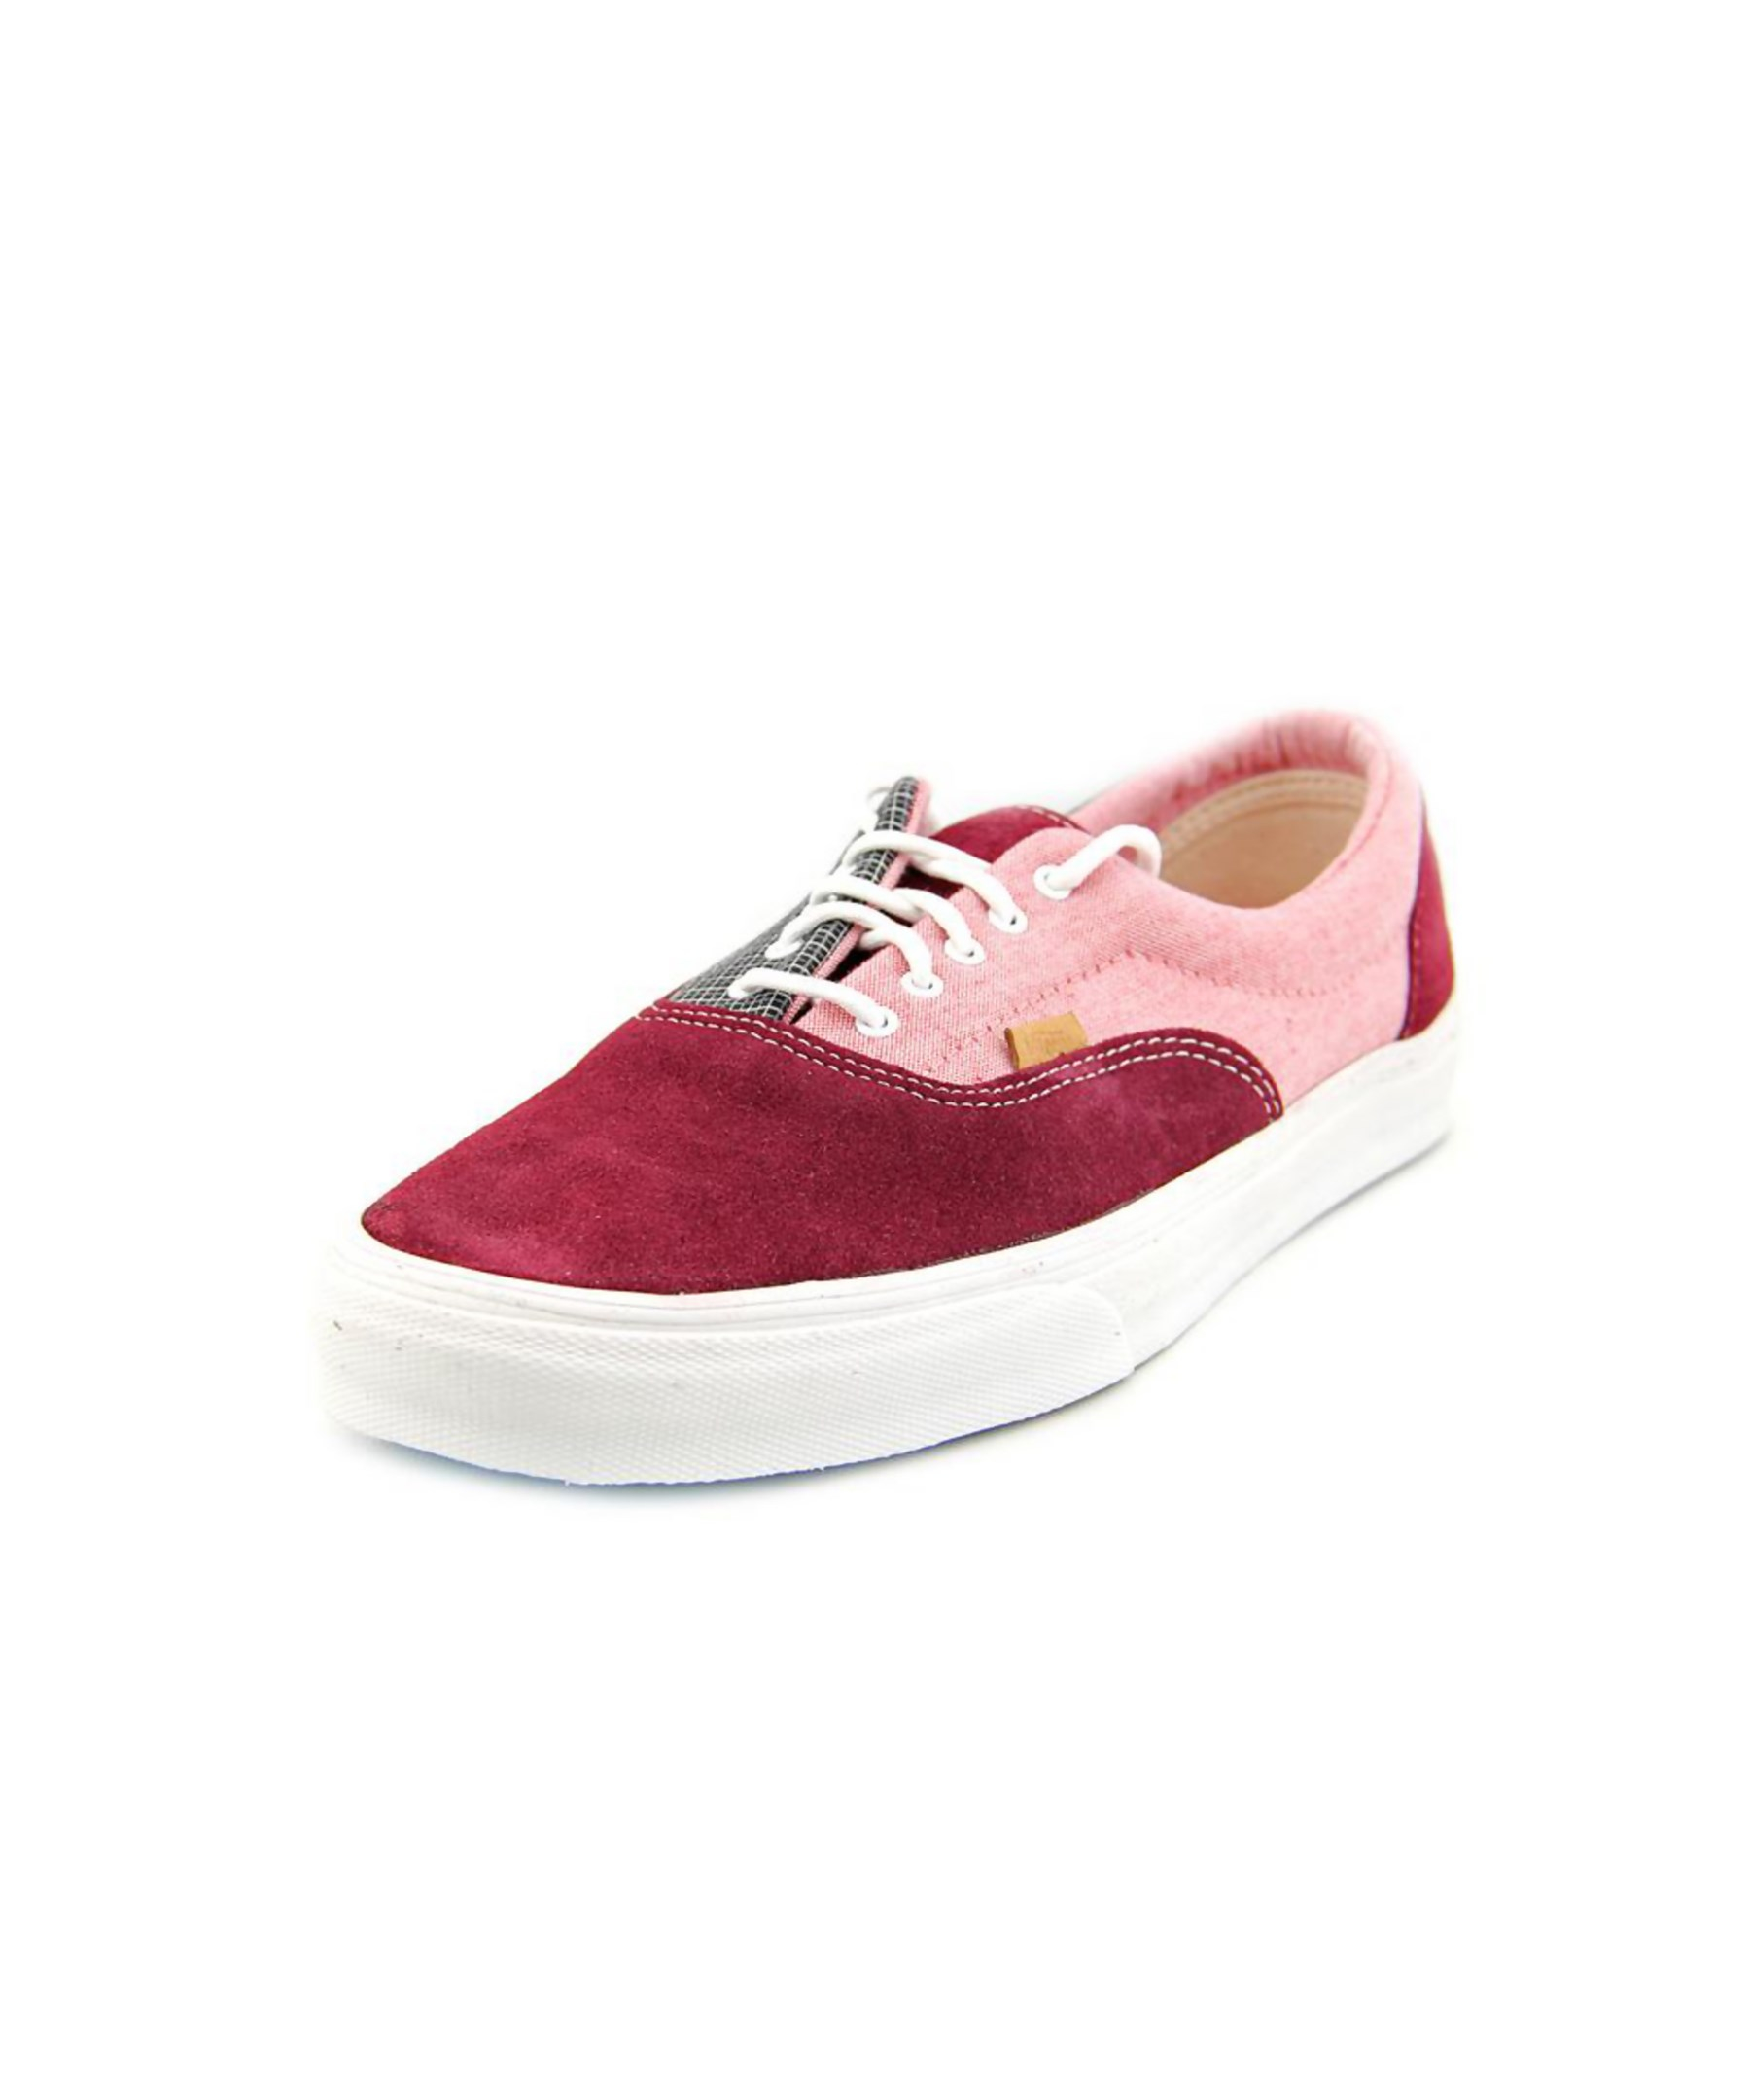 Vans Era Ca Men Round Toe Suede Burgundy Sneakers in Multicolor for Men (red) | Lyst